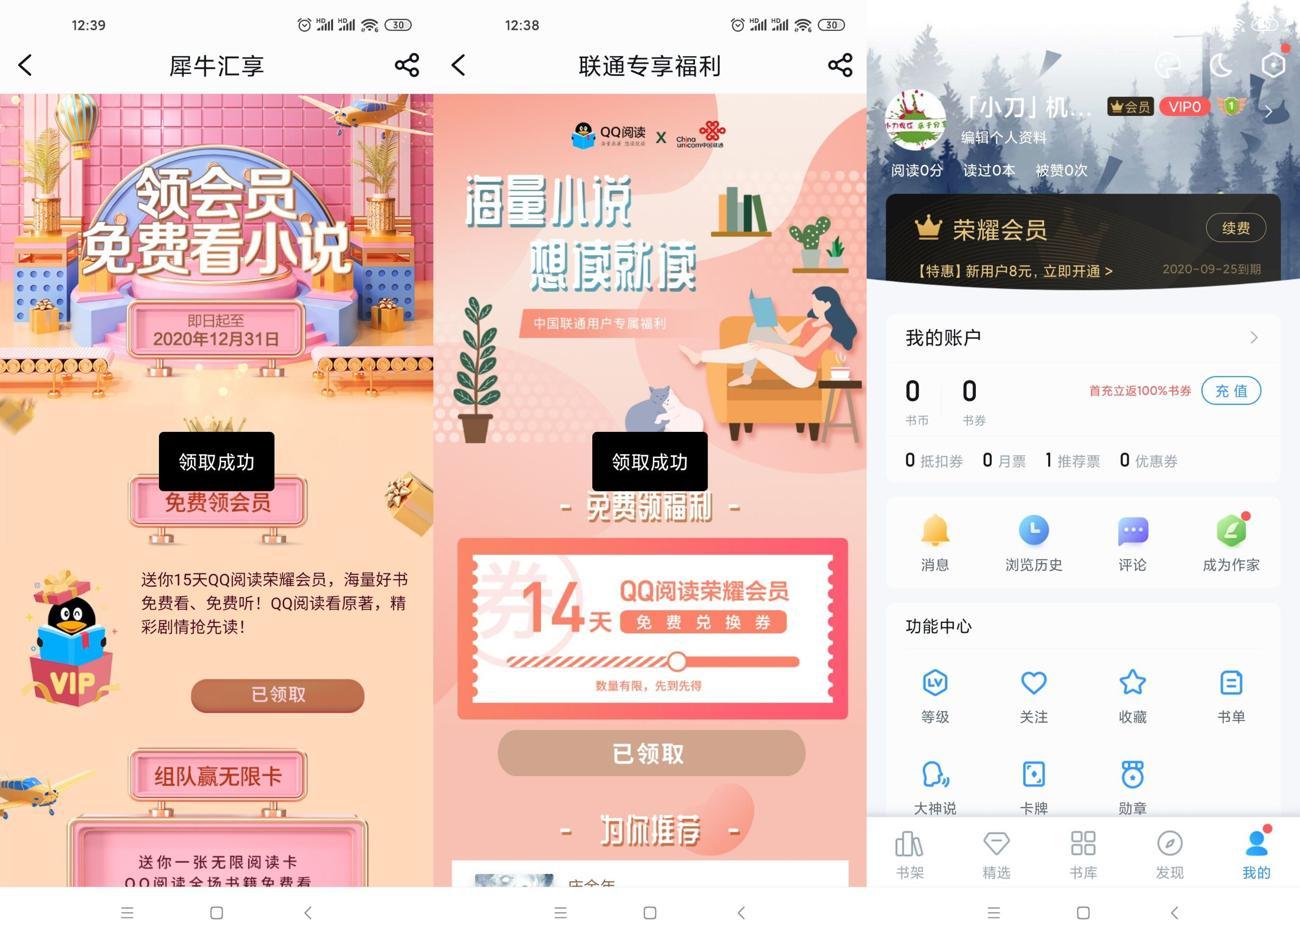 QQ阅读免费领取29天荣耀会员